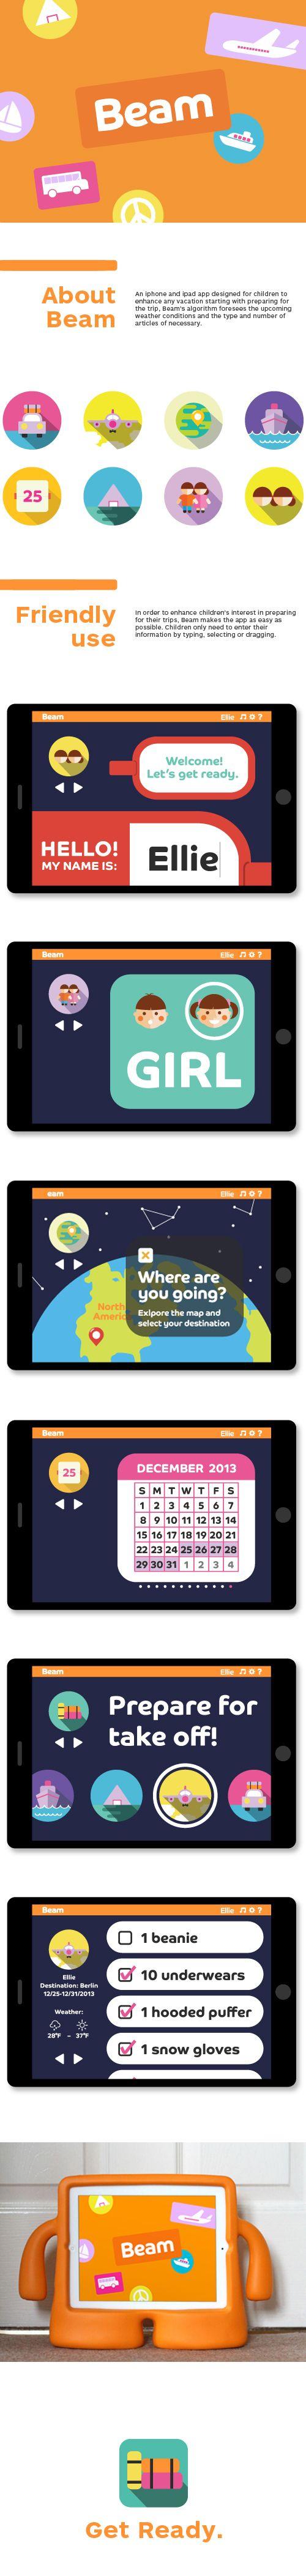 Beam app by Stephy So, via Behance